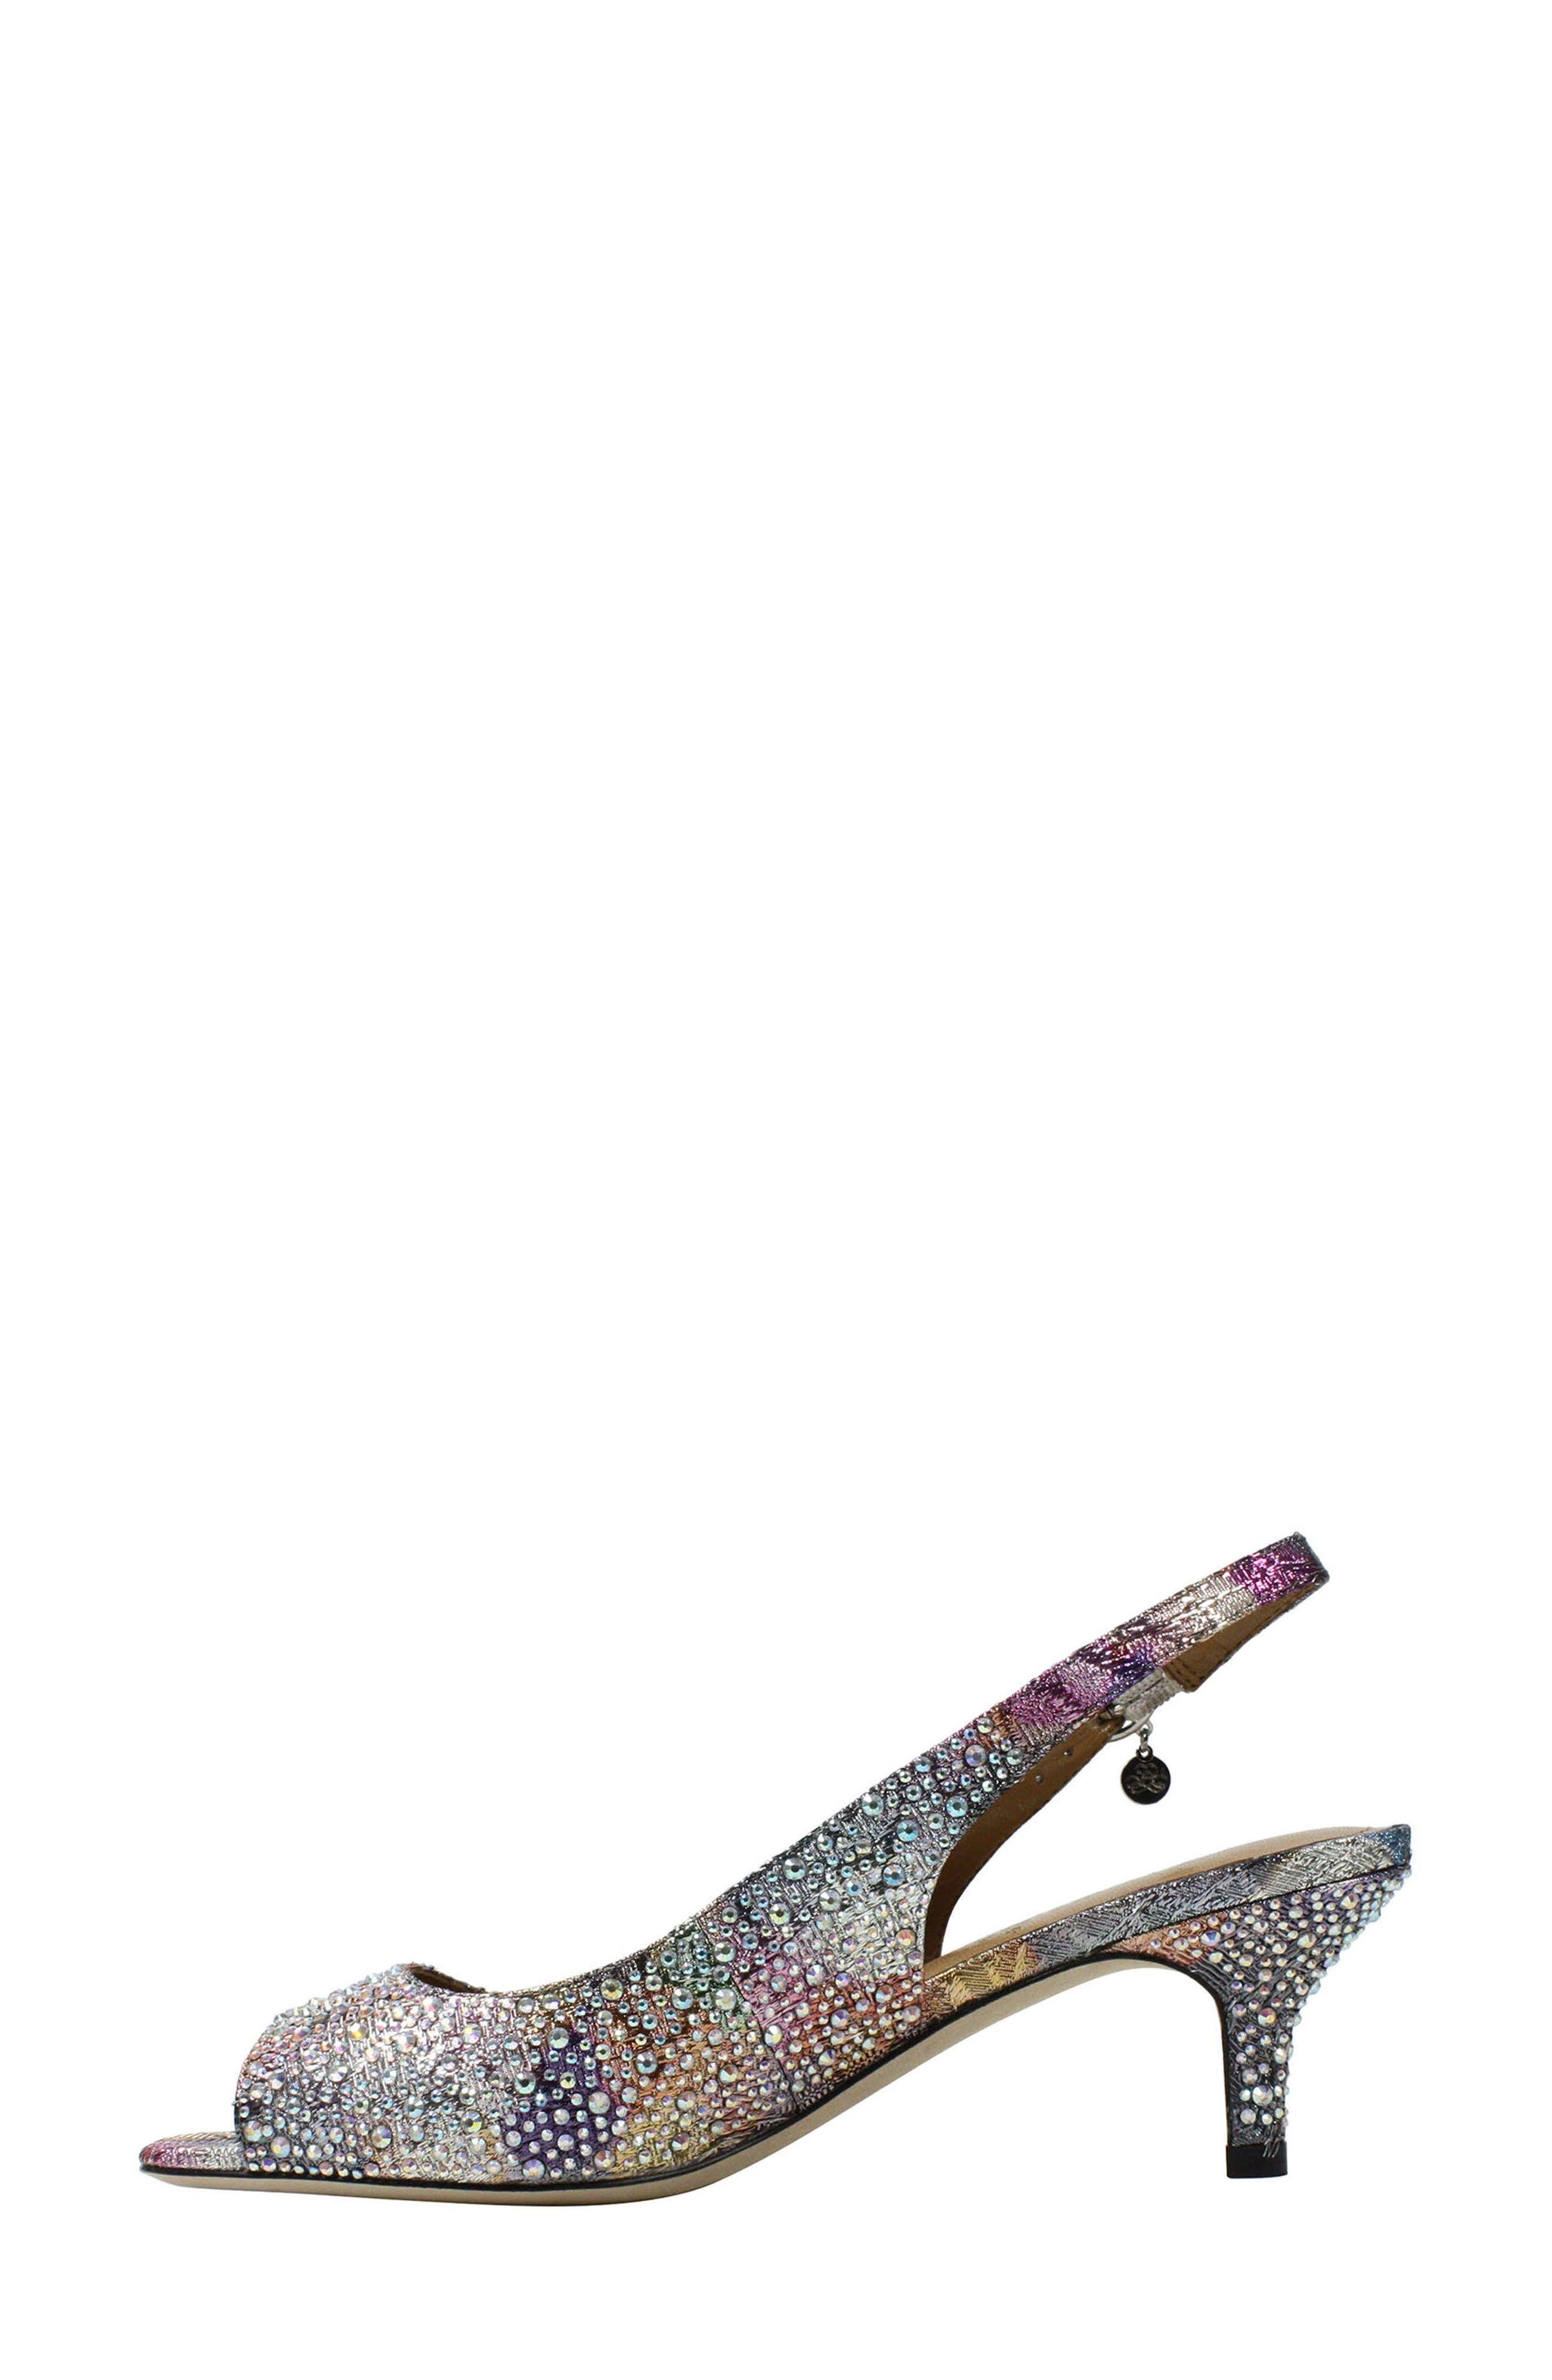 'Impuls' Crystal Embellished Slingback Pump,                             Alternate thumbnail 2, color,                             Silver/ Pastel Fabric